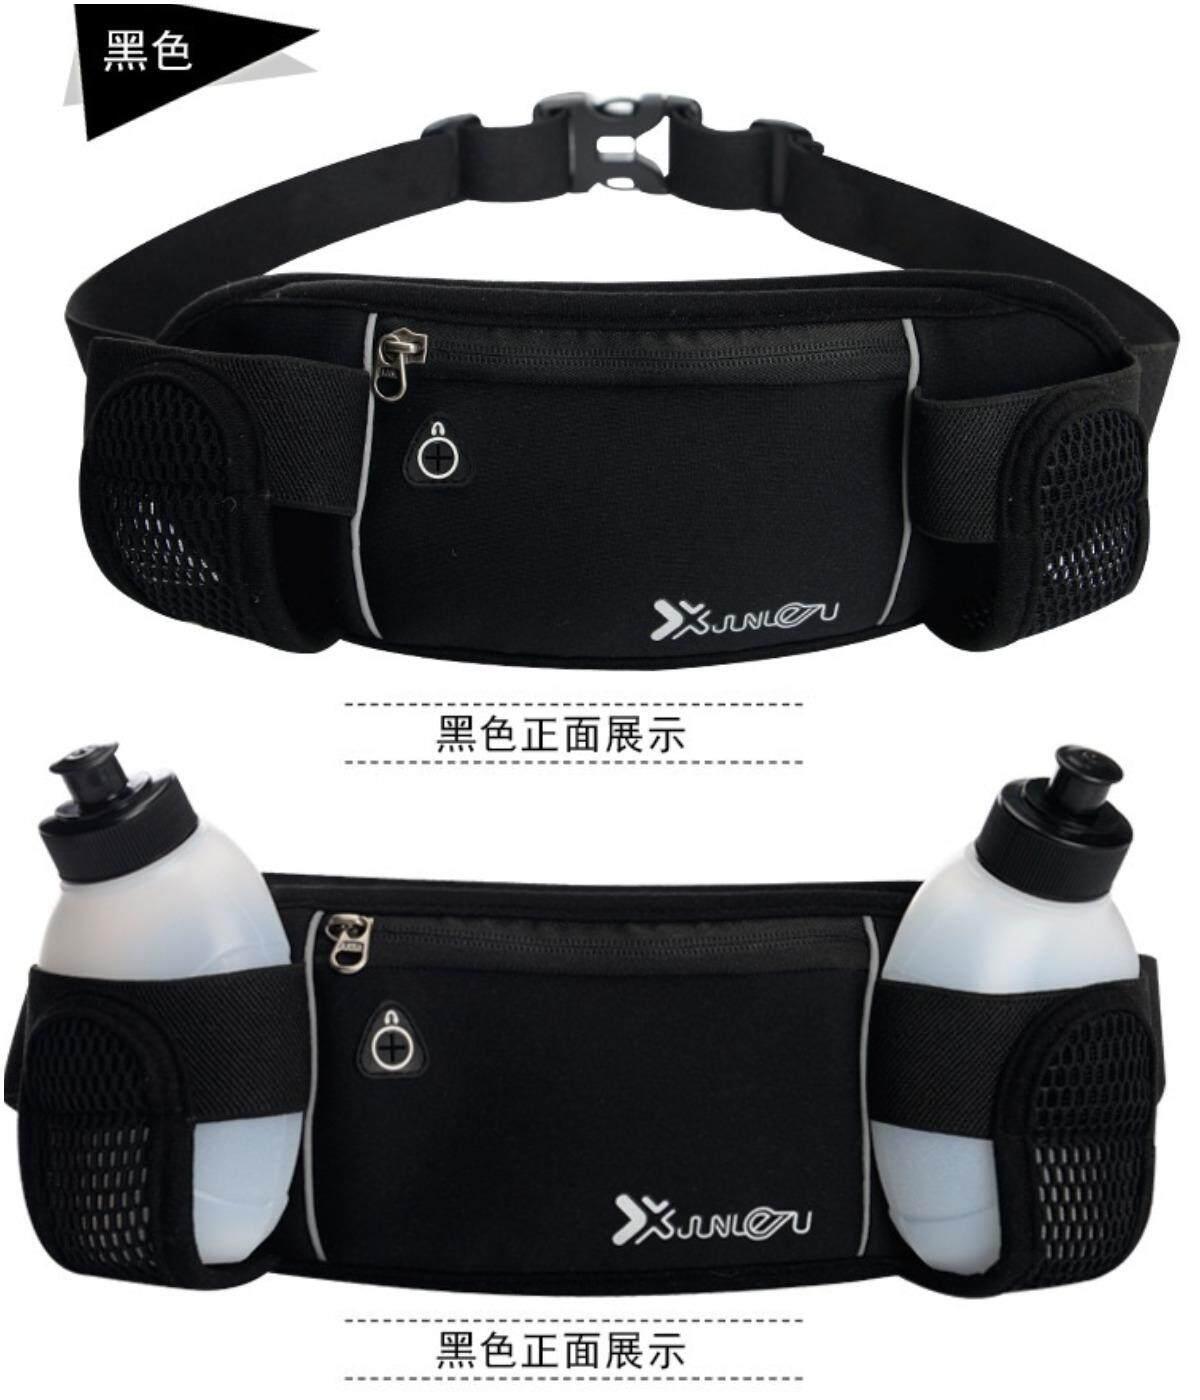 Waterproof Sport Running Waist Band Bag With 2 Bottles(Black)